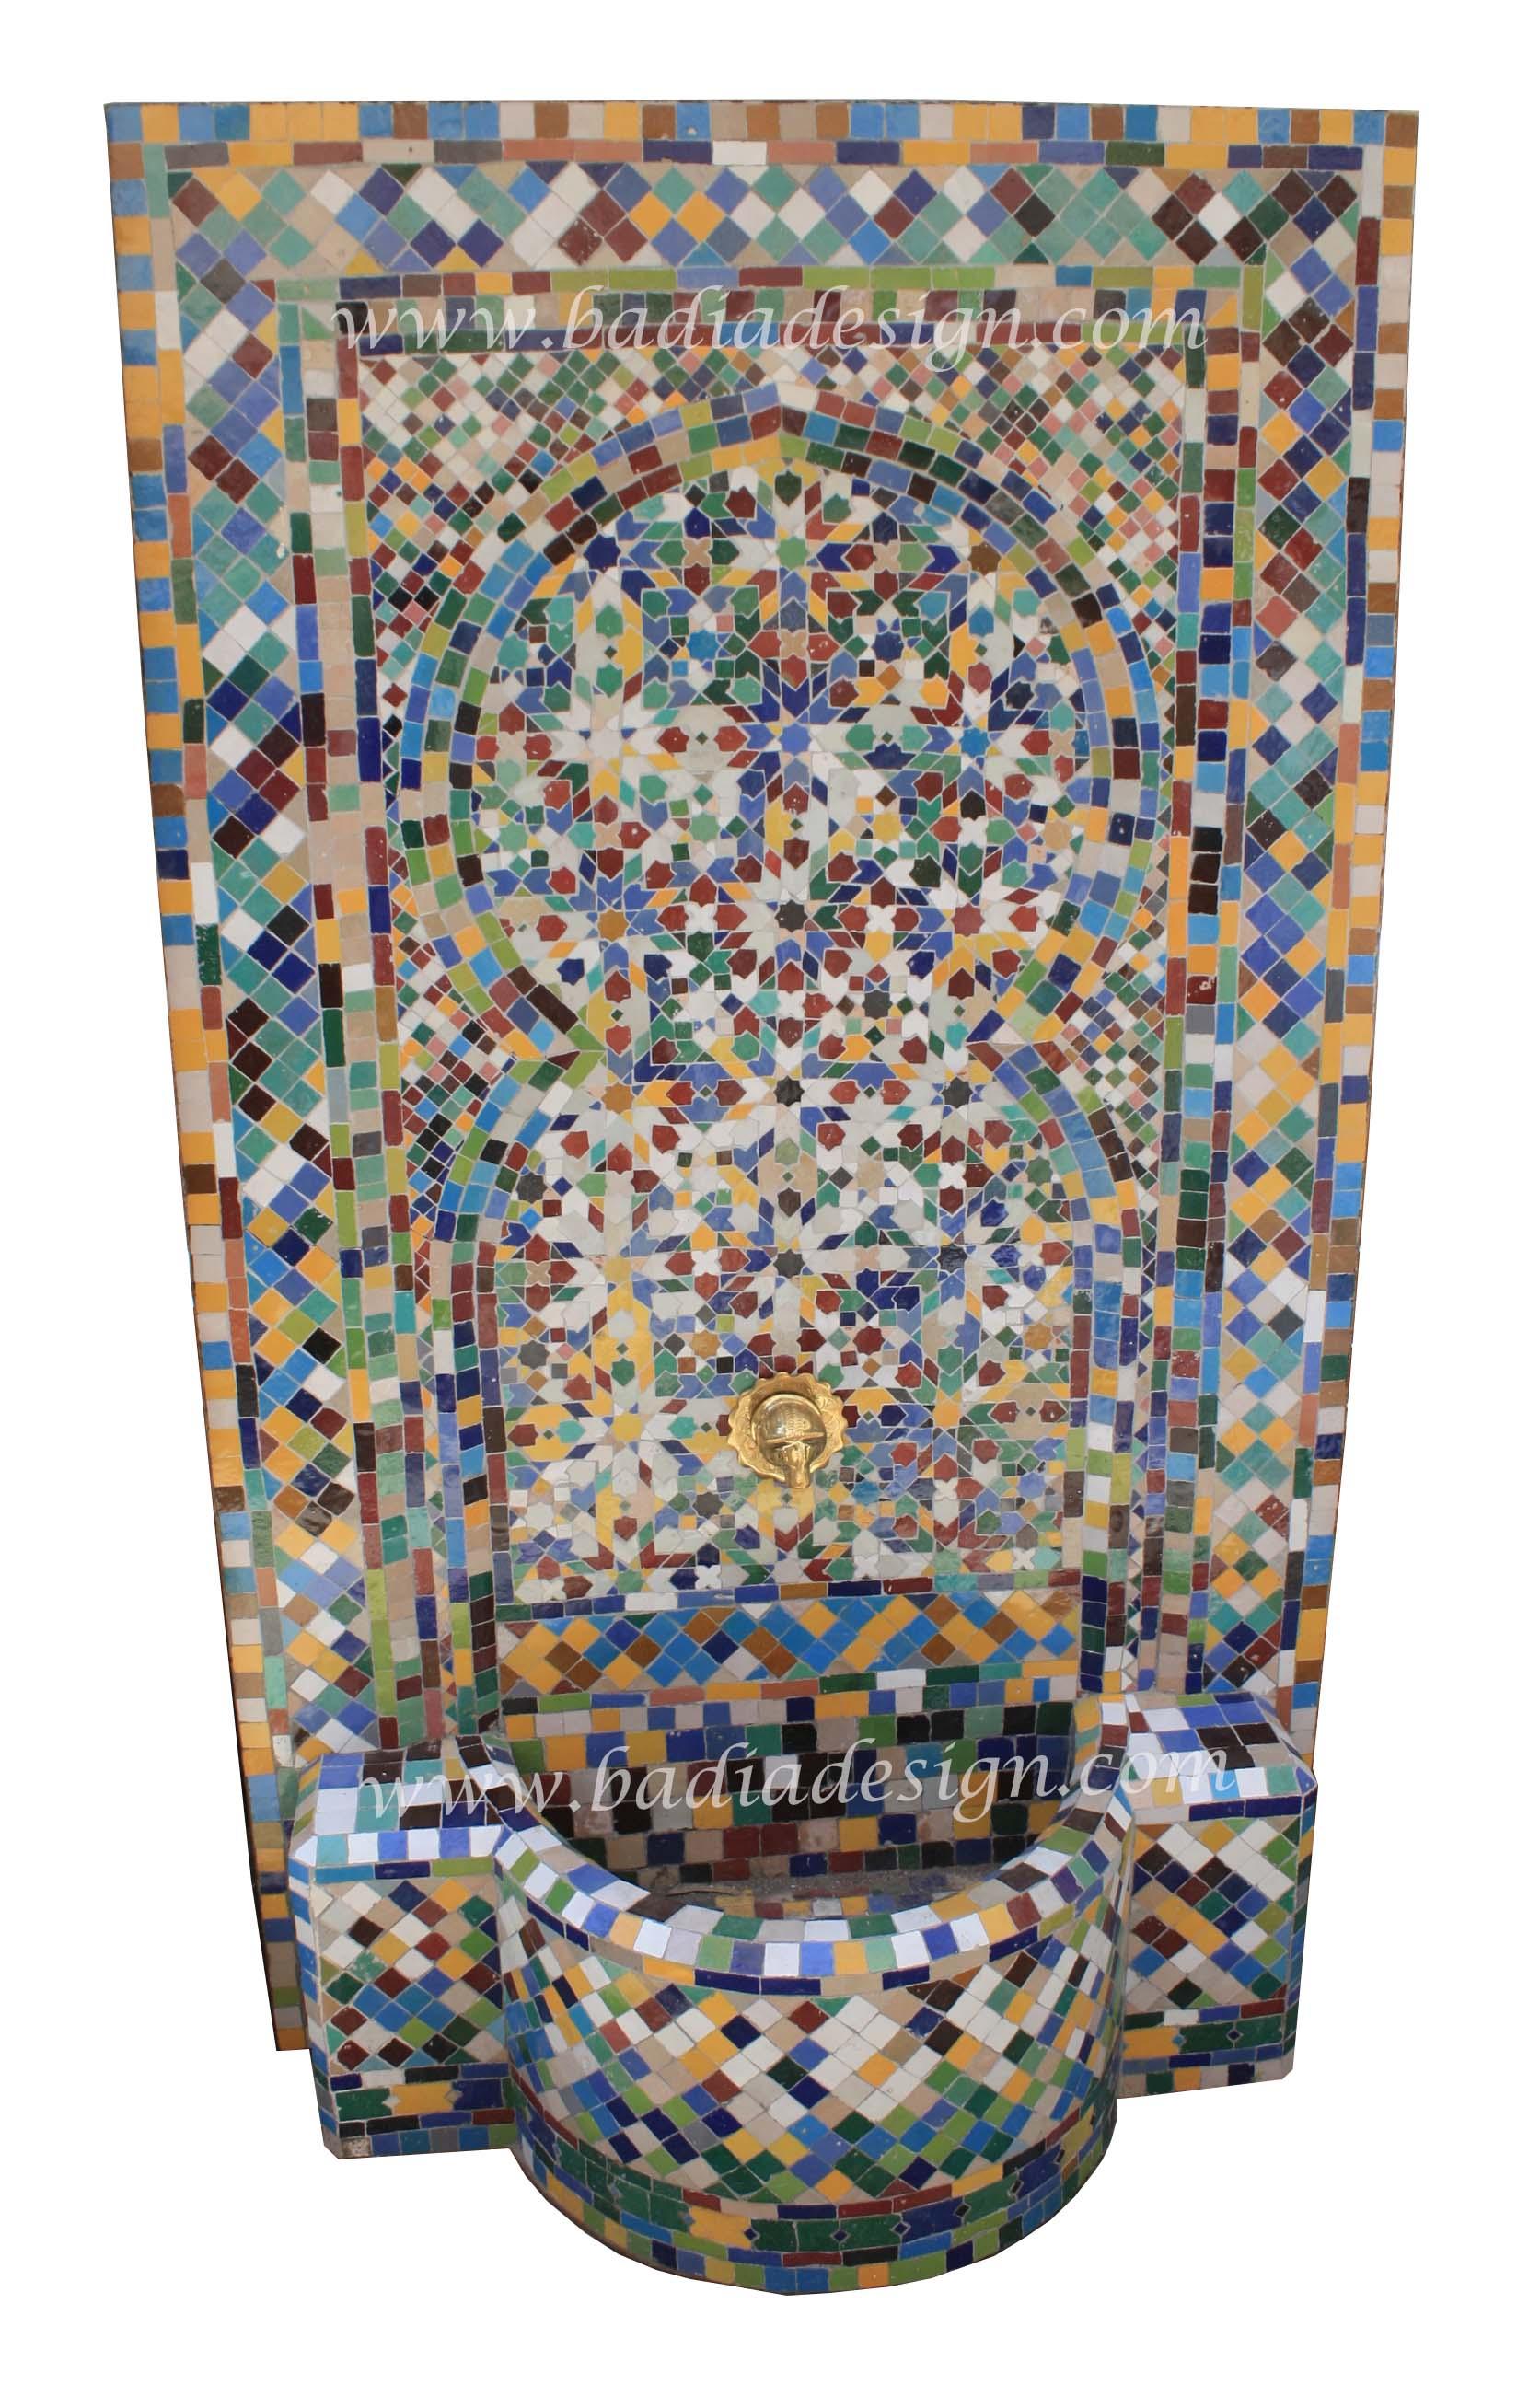 vivid-color-moroccan-mosaic-water-fountain-mf643.jpg